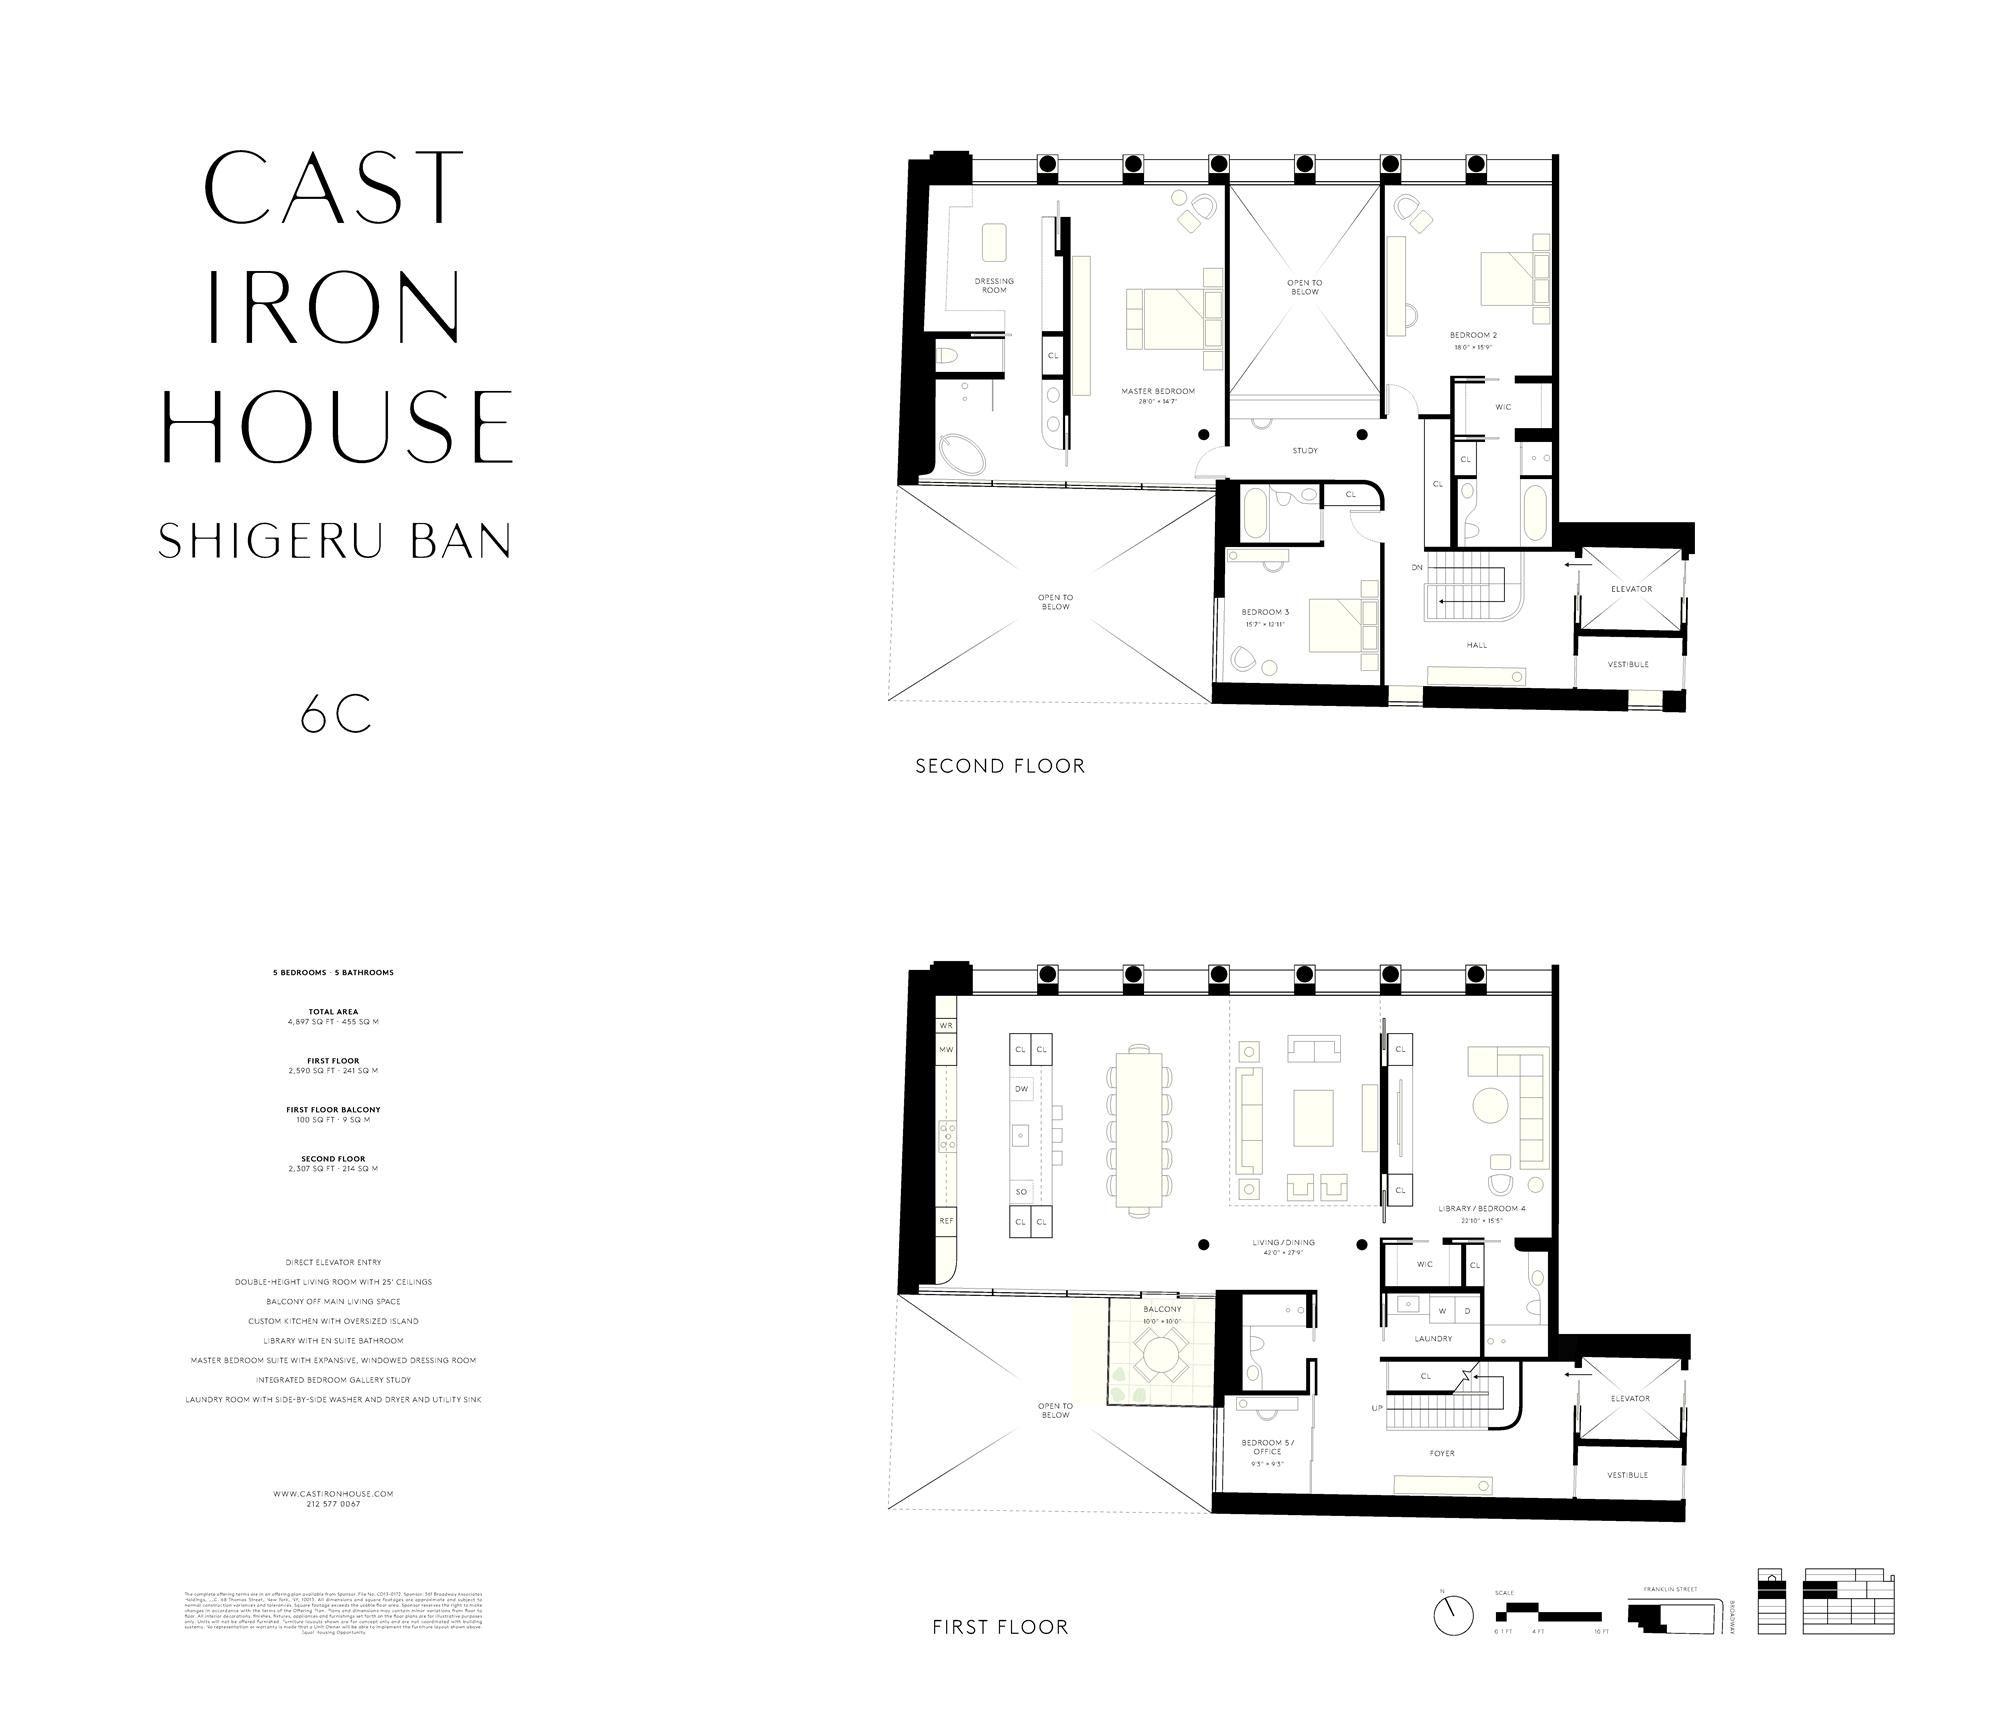 Cast Iron House Shigeru Ban Double Height Lofts 6c Condo Floor Plans It Cast Floor Plans